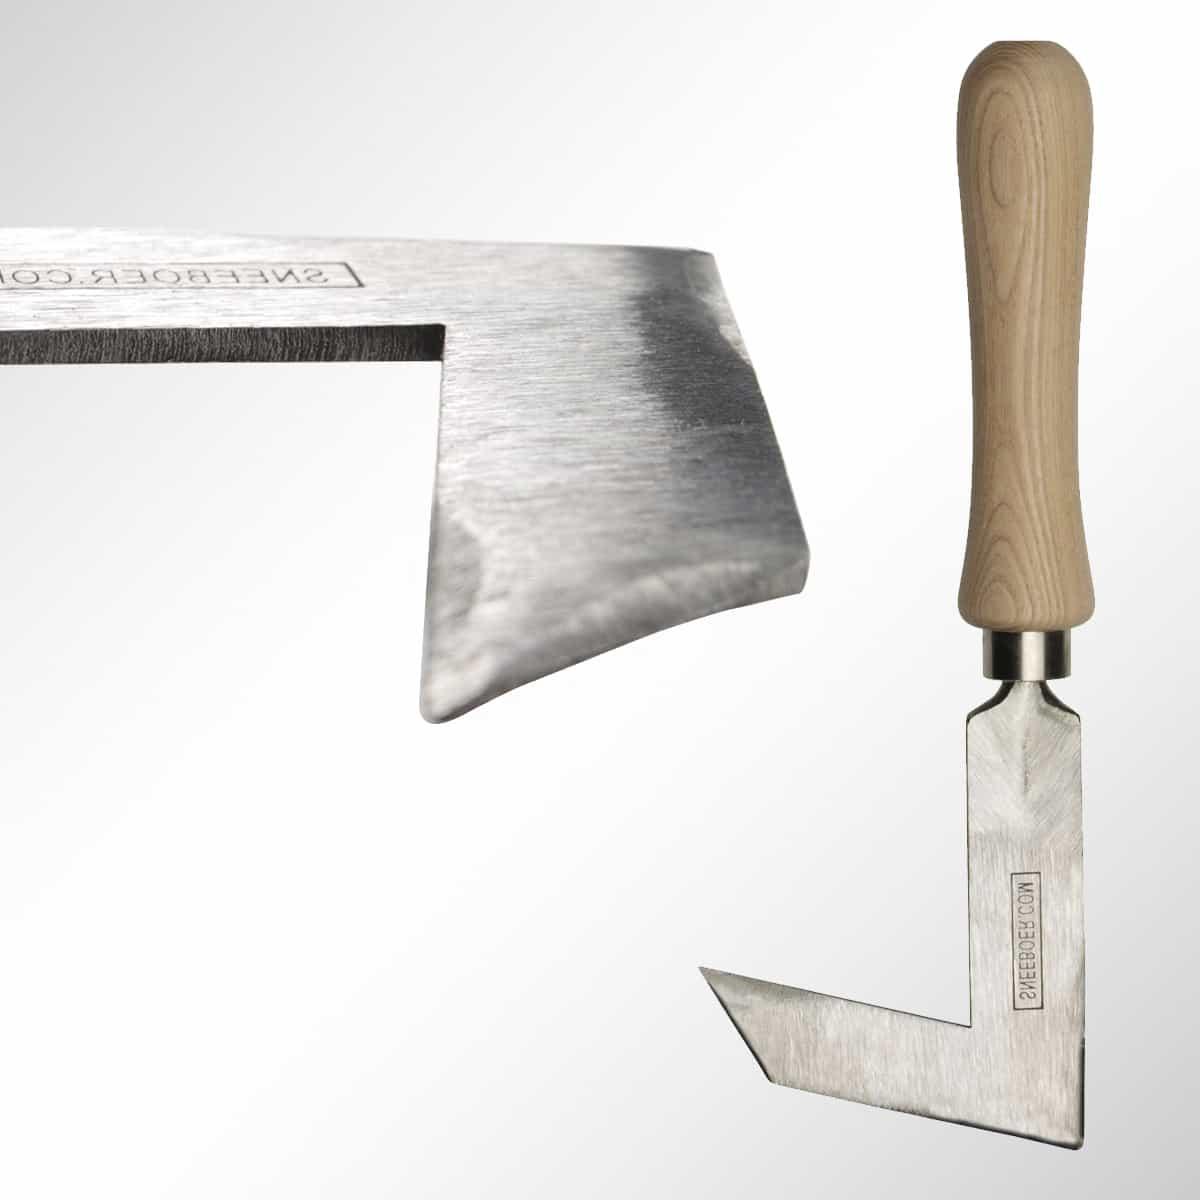 grattoir mousse et mauvaises herbes sneeboer outils une main sneeboer. Black Bedroom Furniture Sets. Home Design Ideas